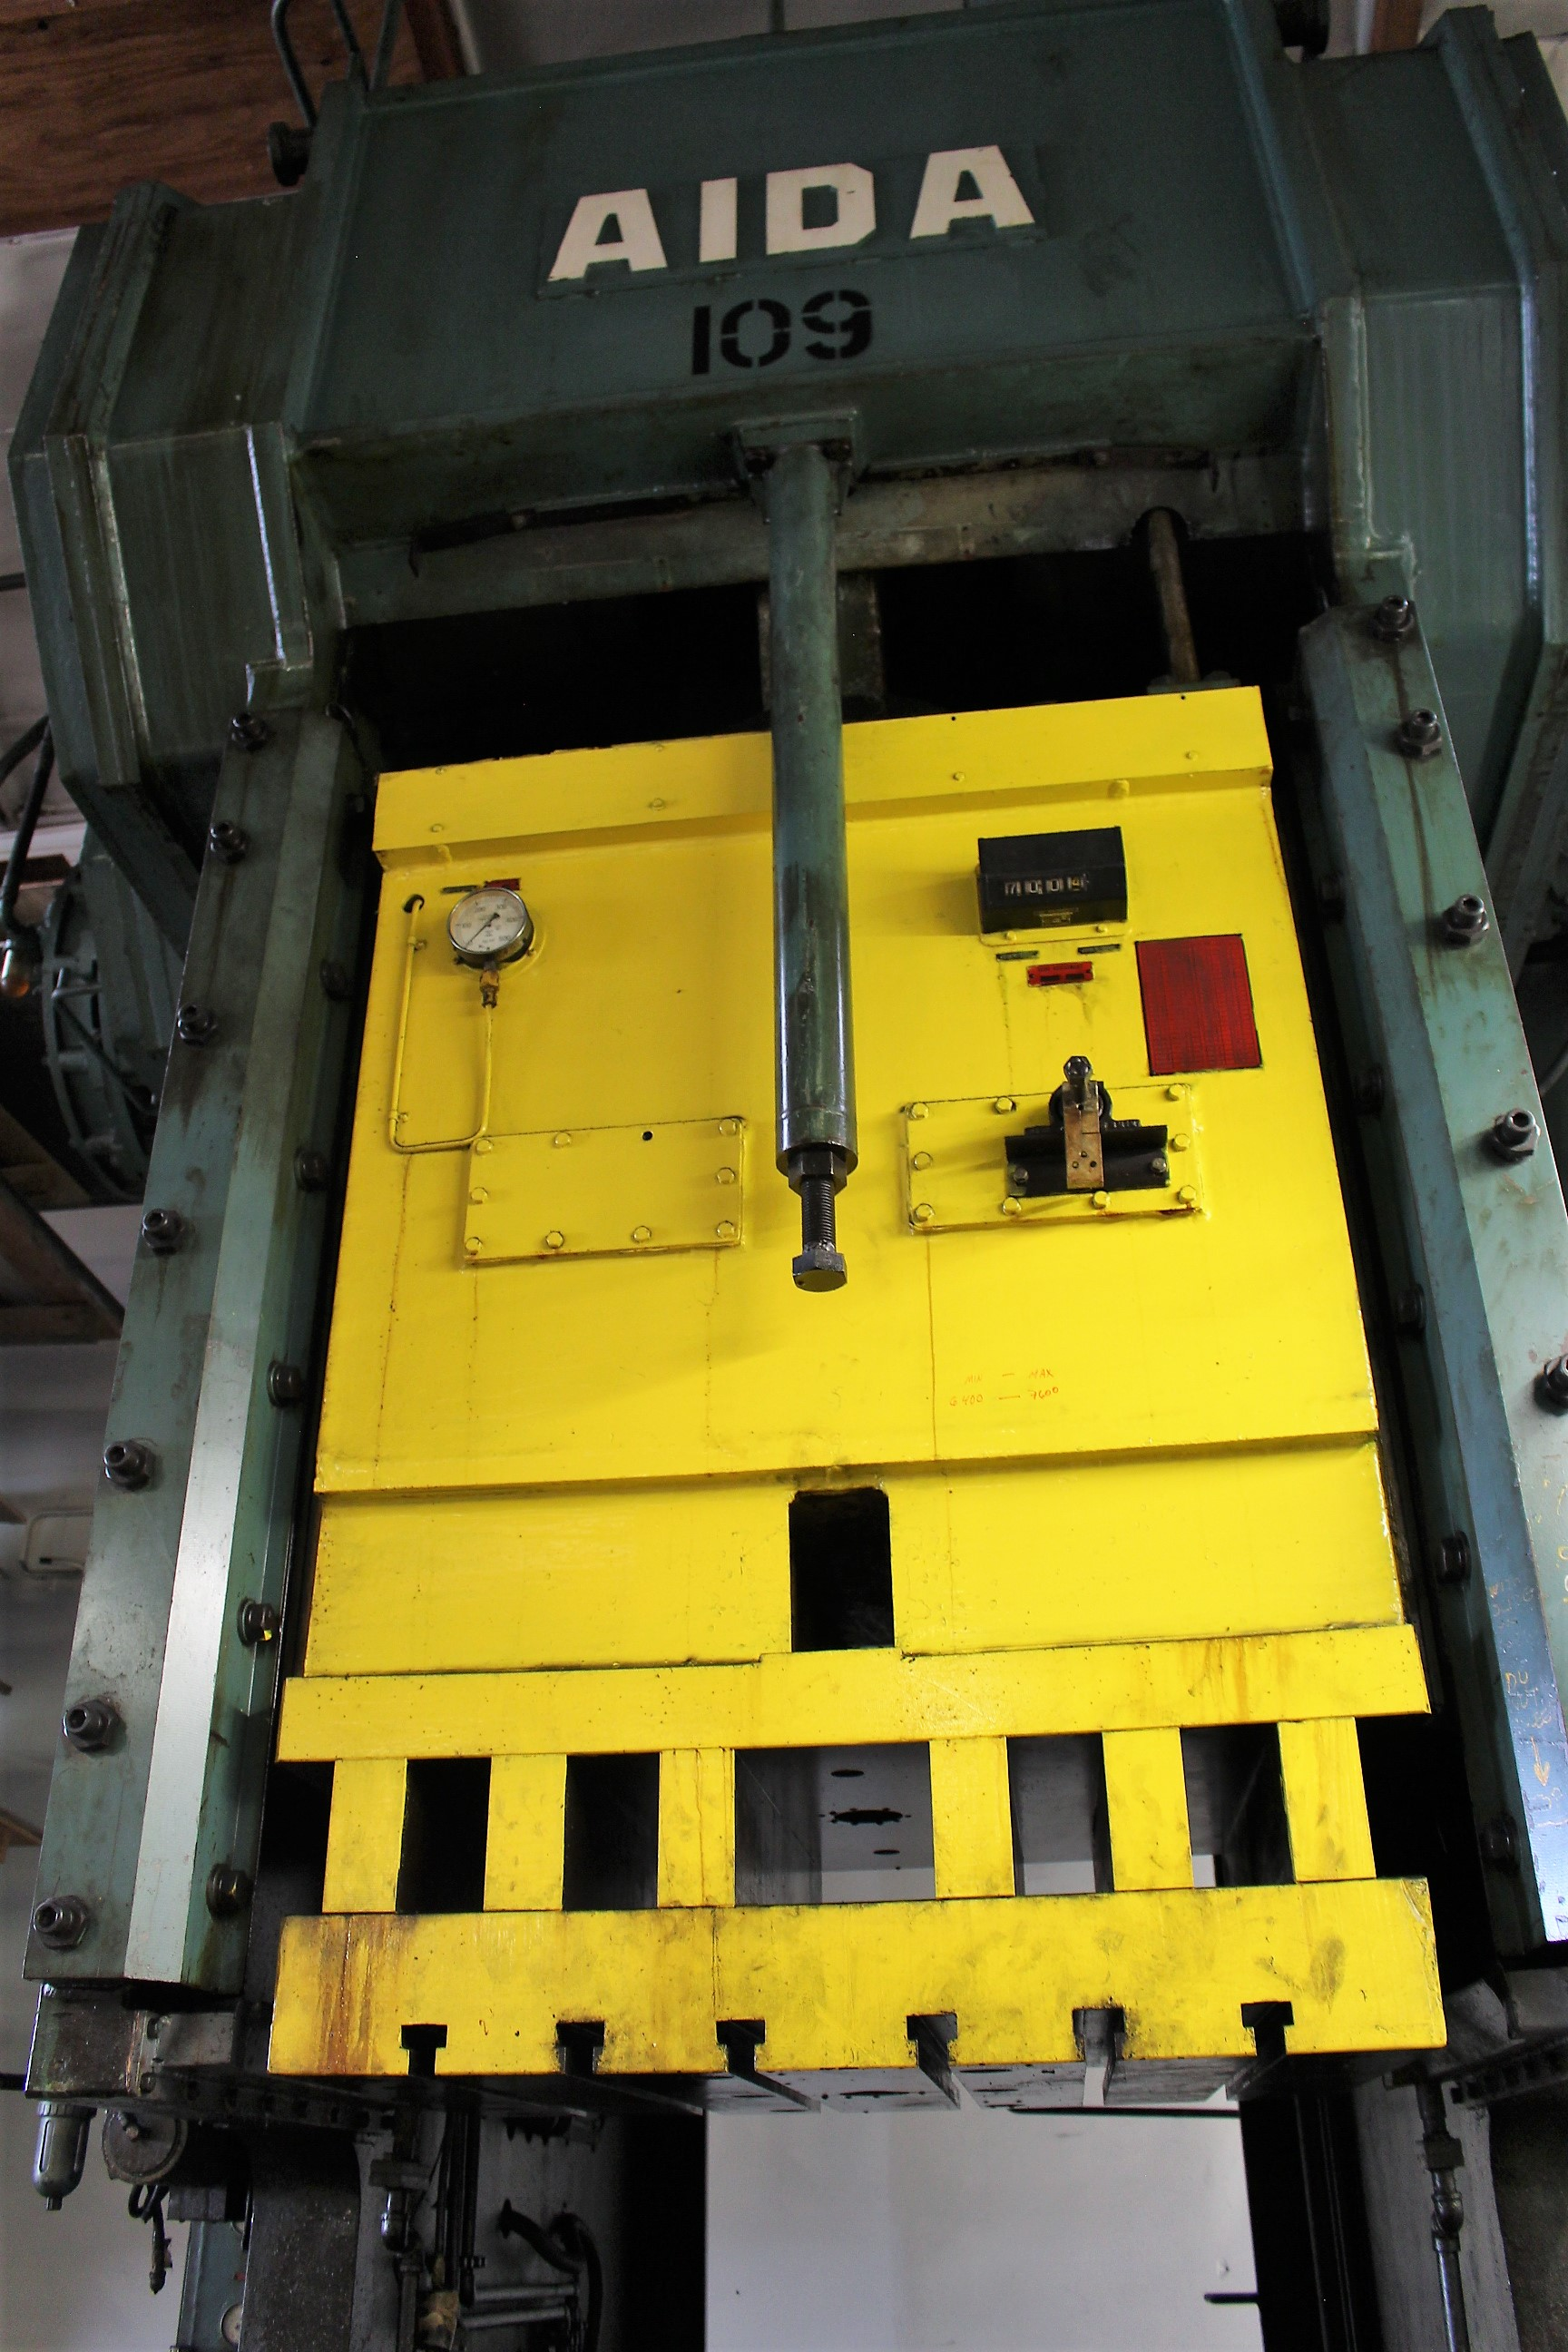 "AIDA MODEL PC-30 PUNCH PRESS, 300 TON CAPACITY,AIR CUSHION, 15.7"" STROKE, 30 SPM, 70"" X 30"" - Image 4 of 21"